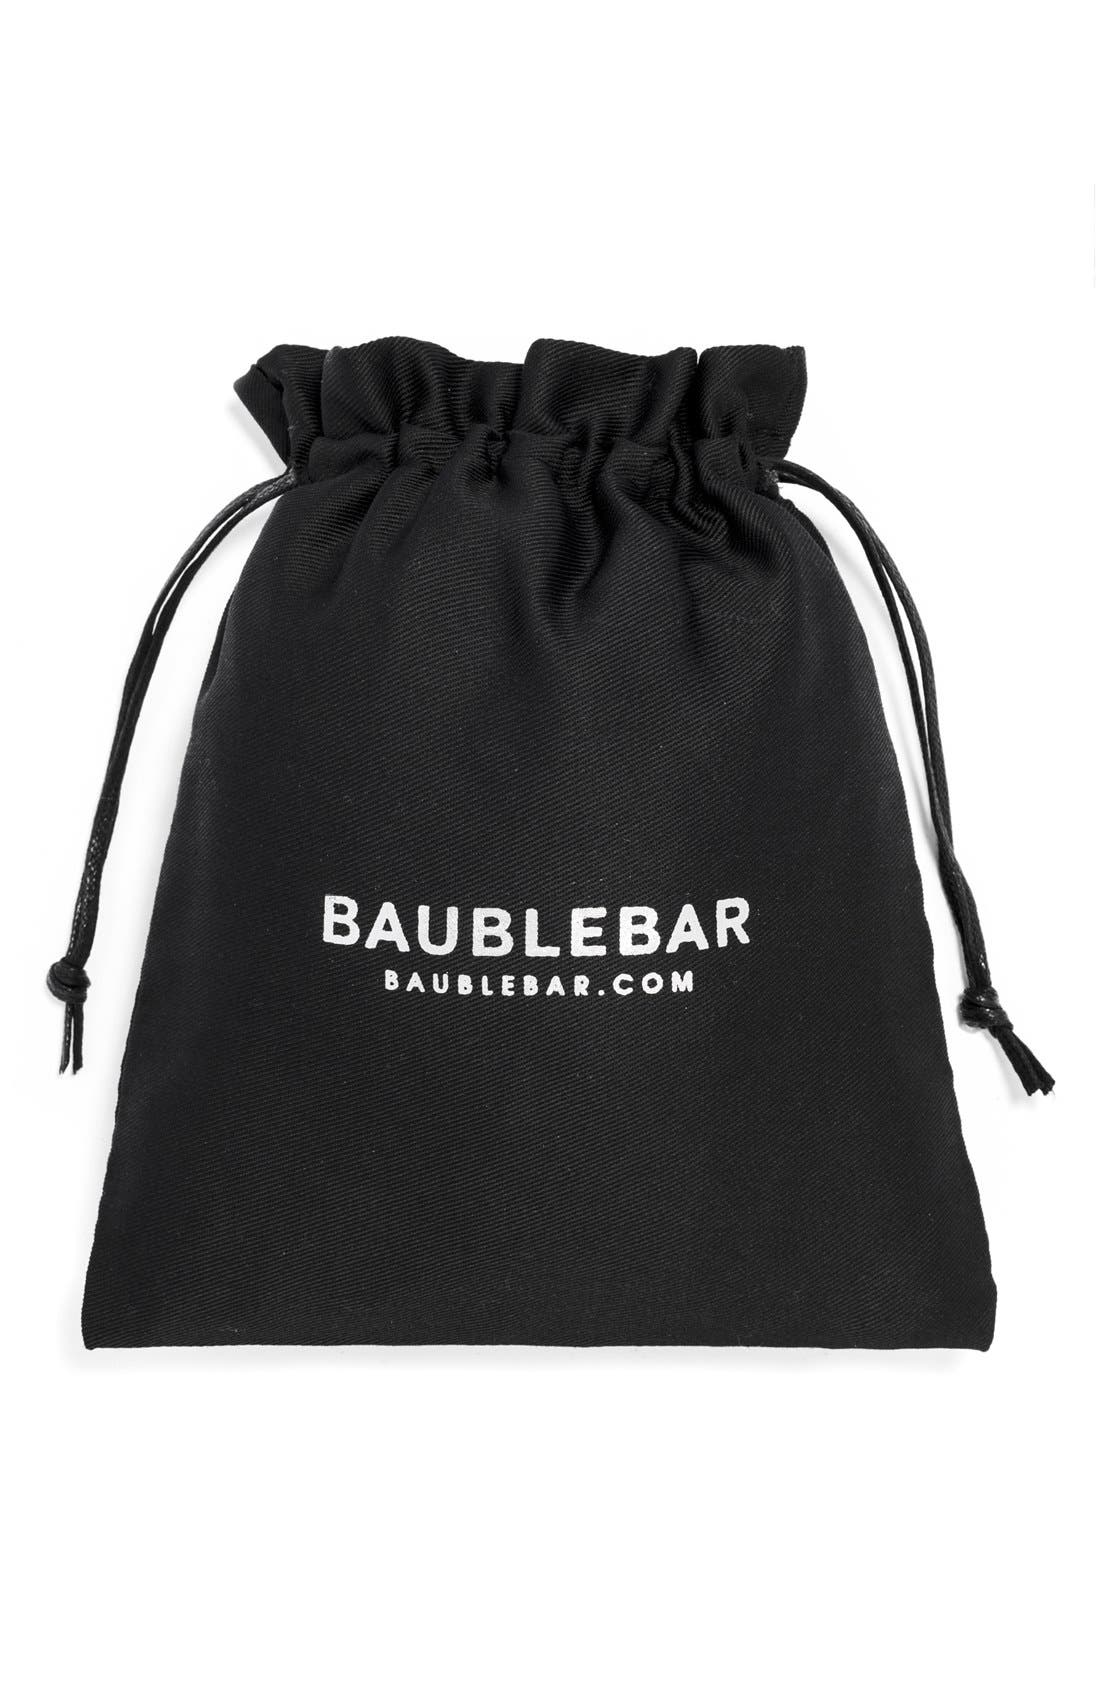 BAUBLEBAR,                             'Smoky Frank' Drop Earrings,                             Alternate thumbnail 2, color,                             020